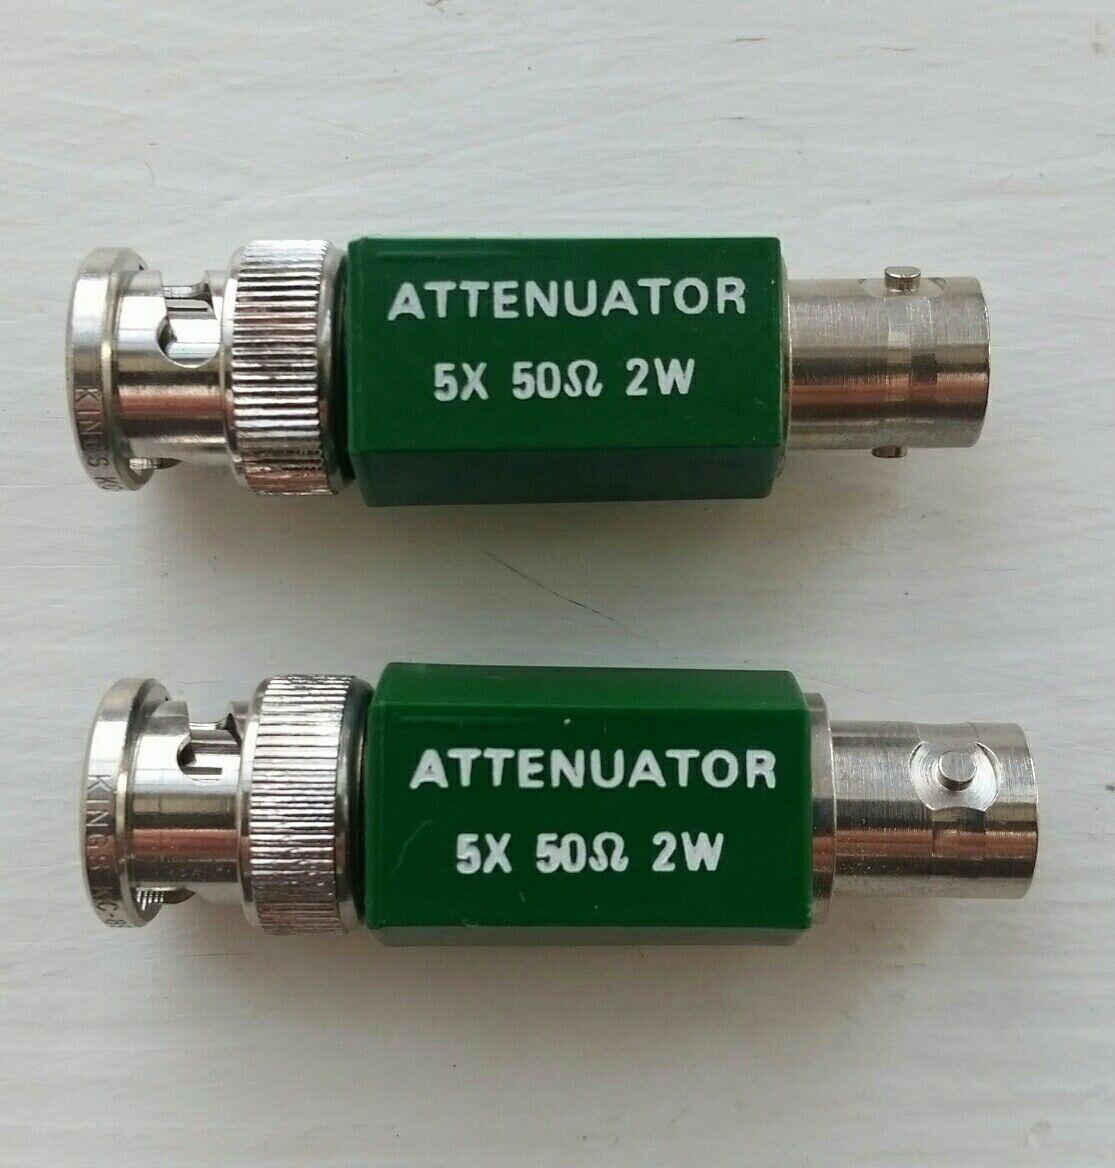 Tektronix Feed Through Terminator  5X Attenuator  2 W   50 Ohm  011-0060-02  BNC